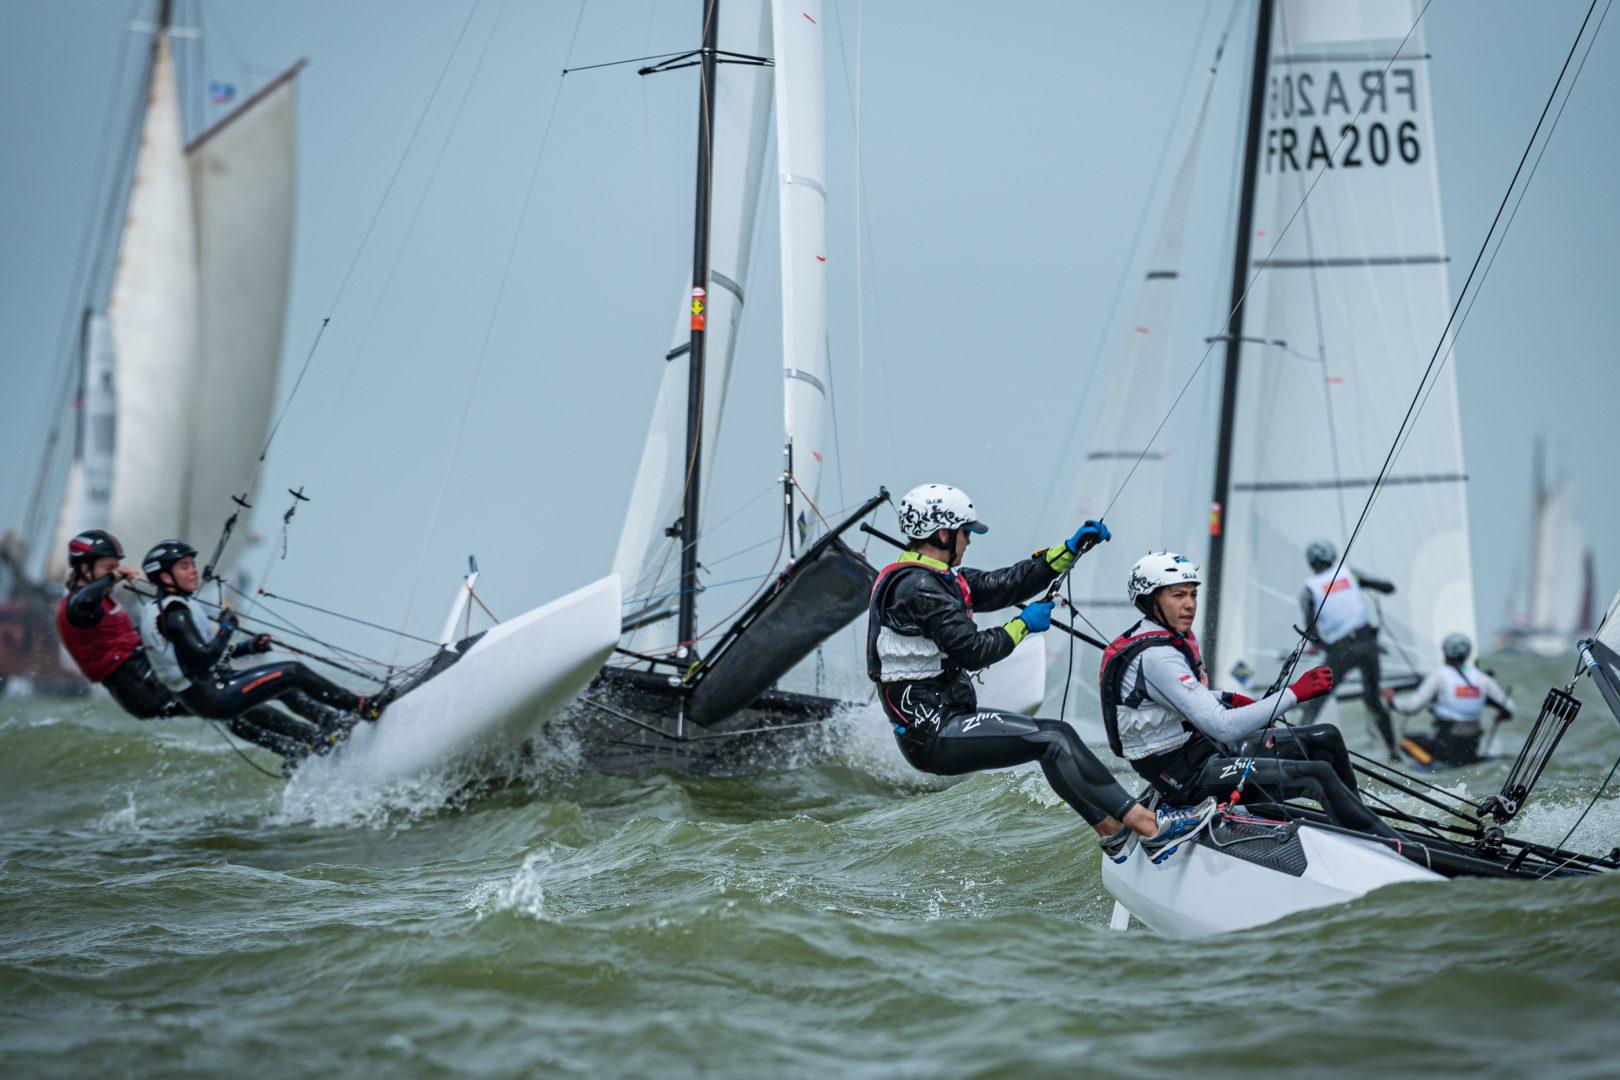 Dutch Youth Regatta 2019 day one sailed in choppy conditions